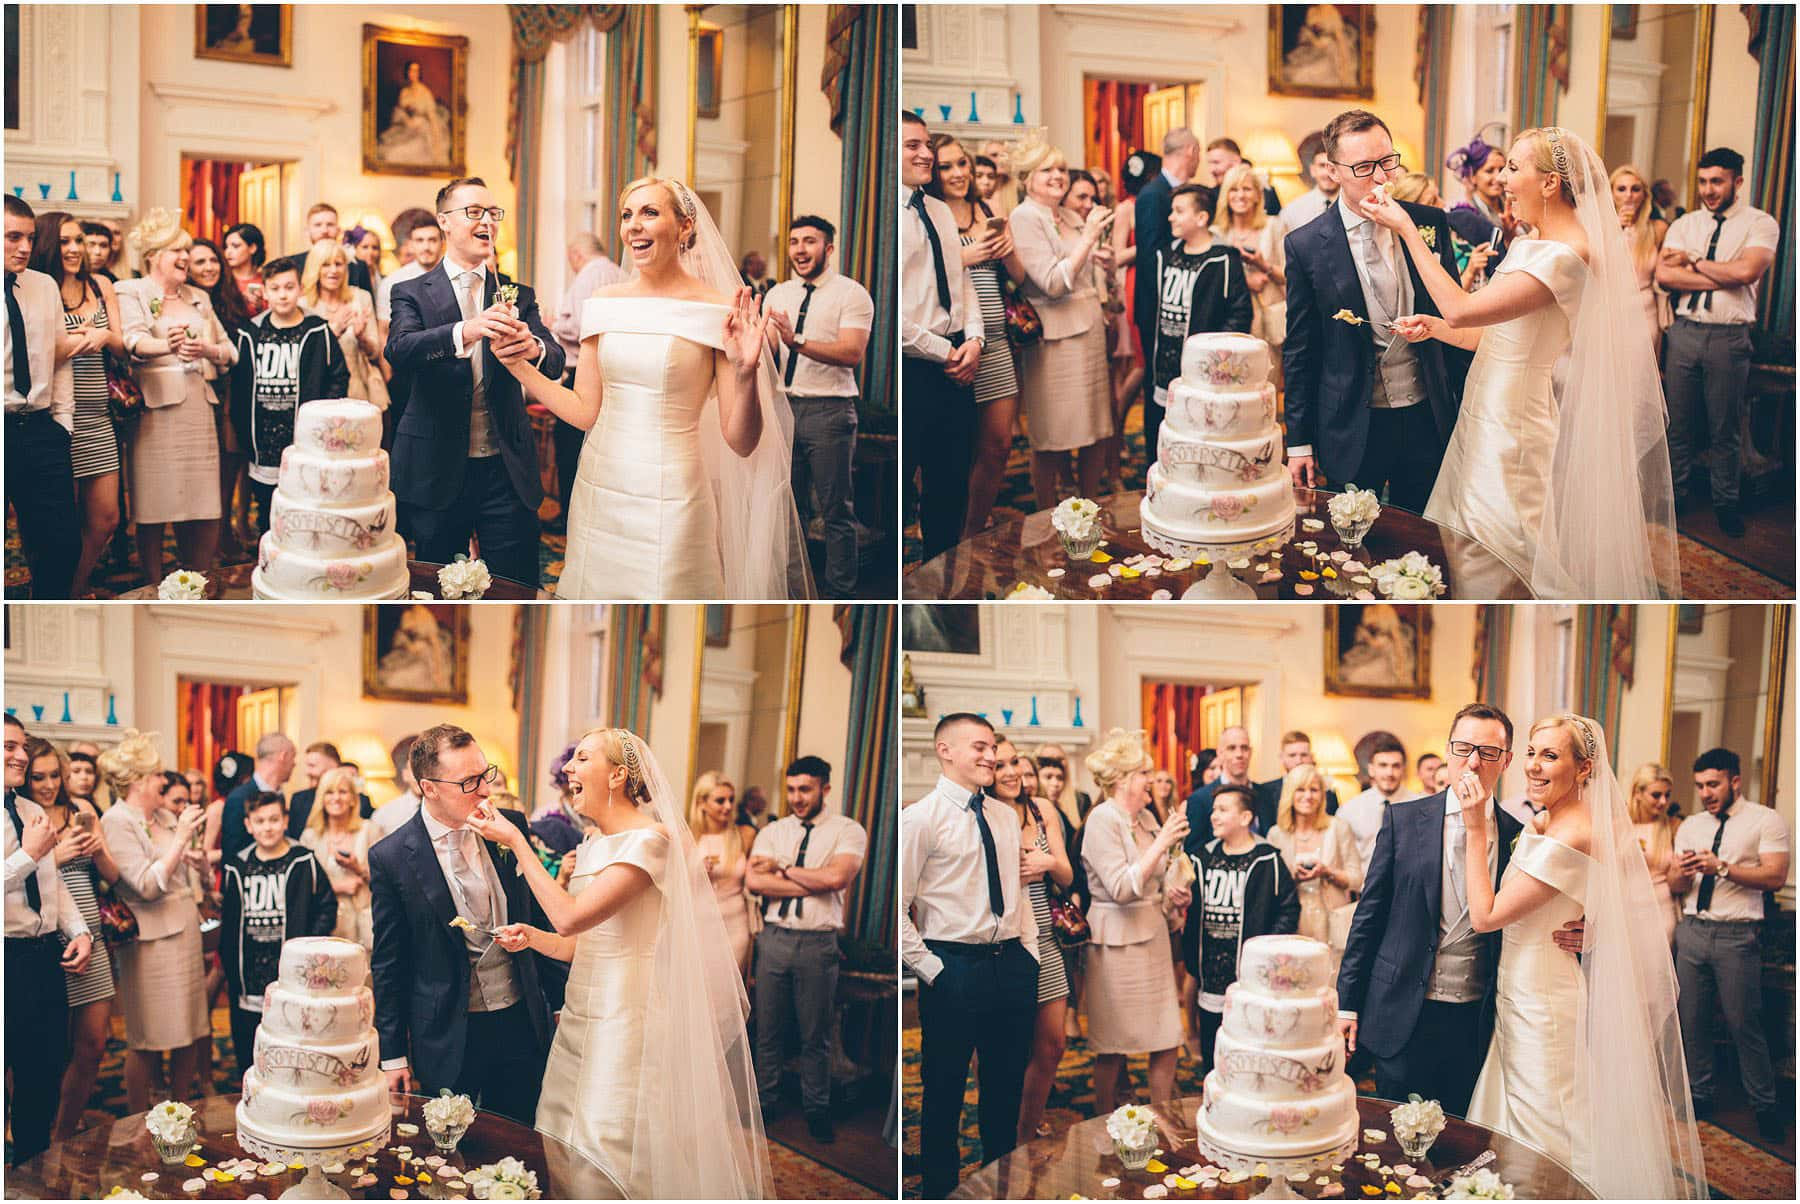 Capesthorne_Hall_Wedding_Photography_0134